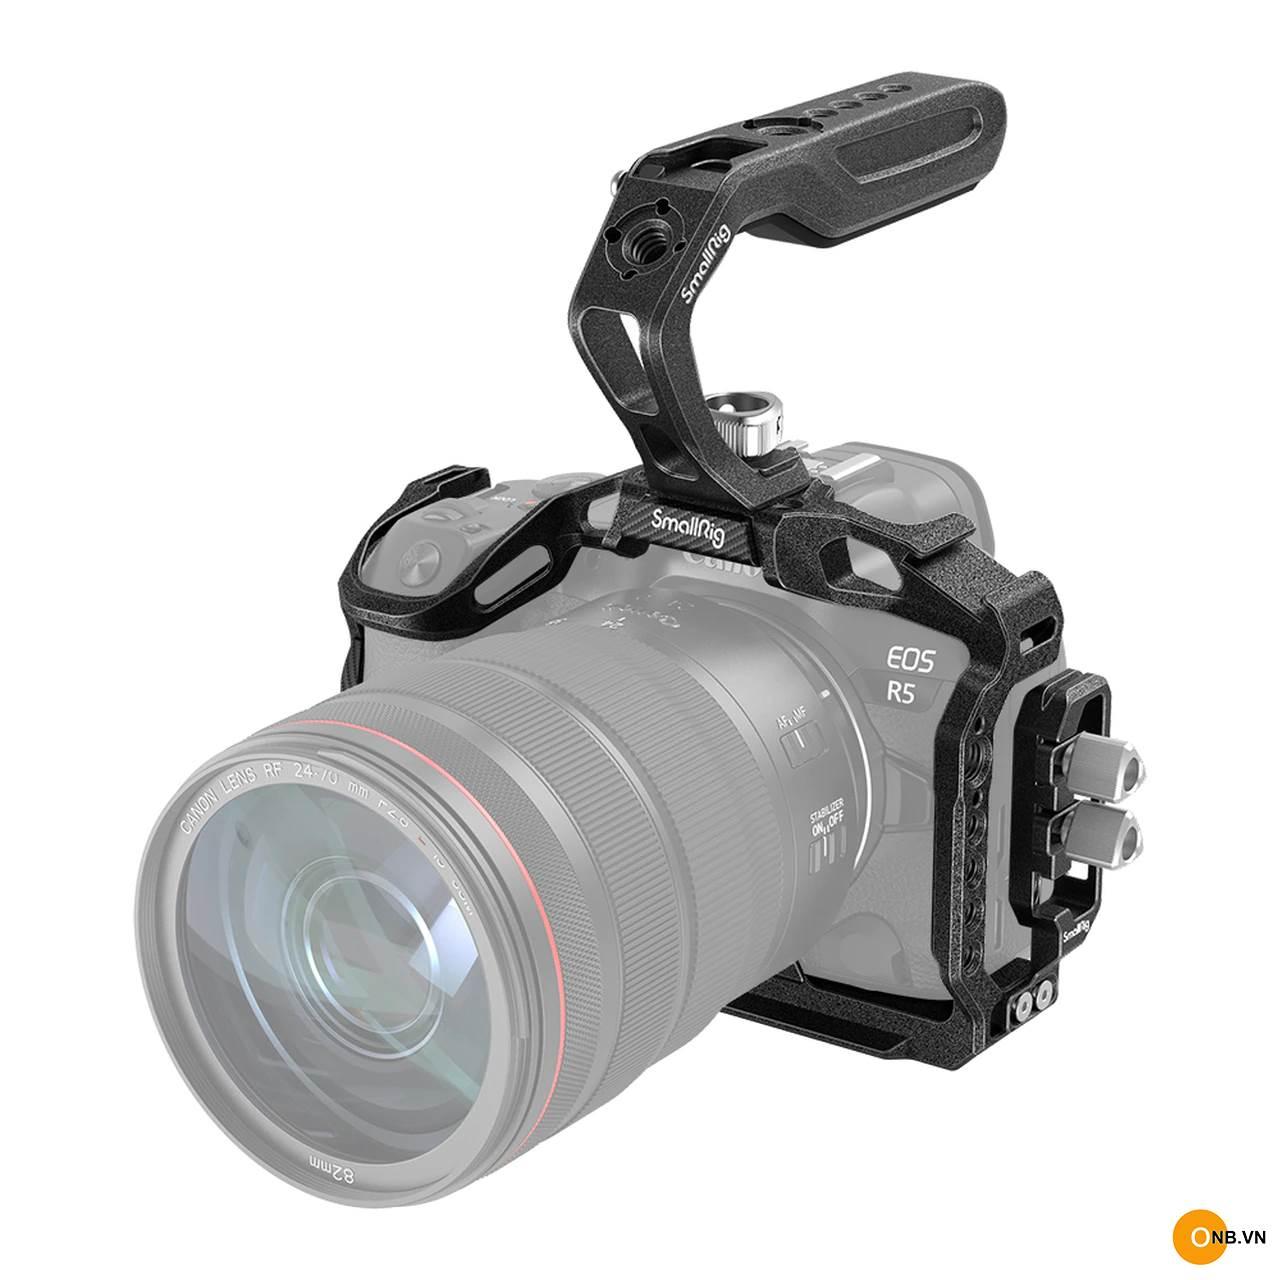 SmallRig Black Mamba Kit for Canon EOS R5 R6 3234